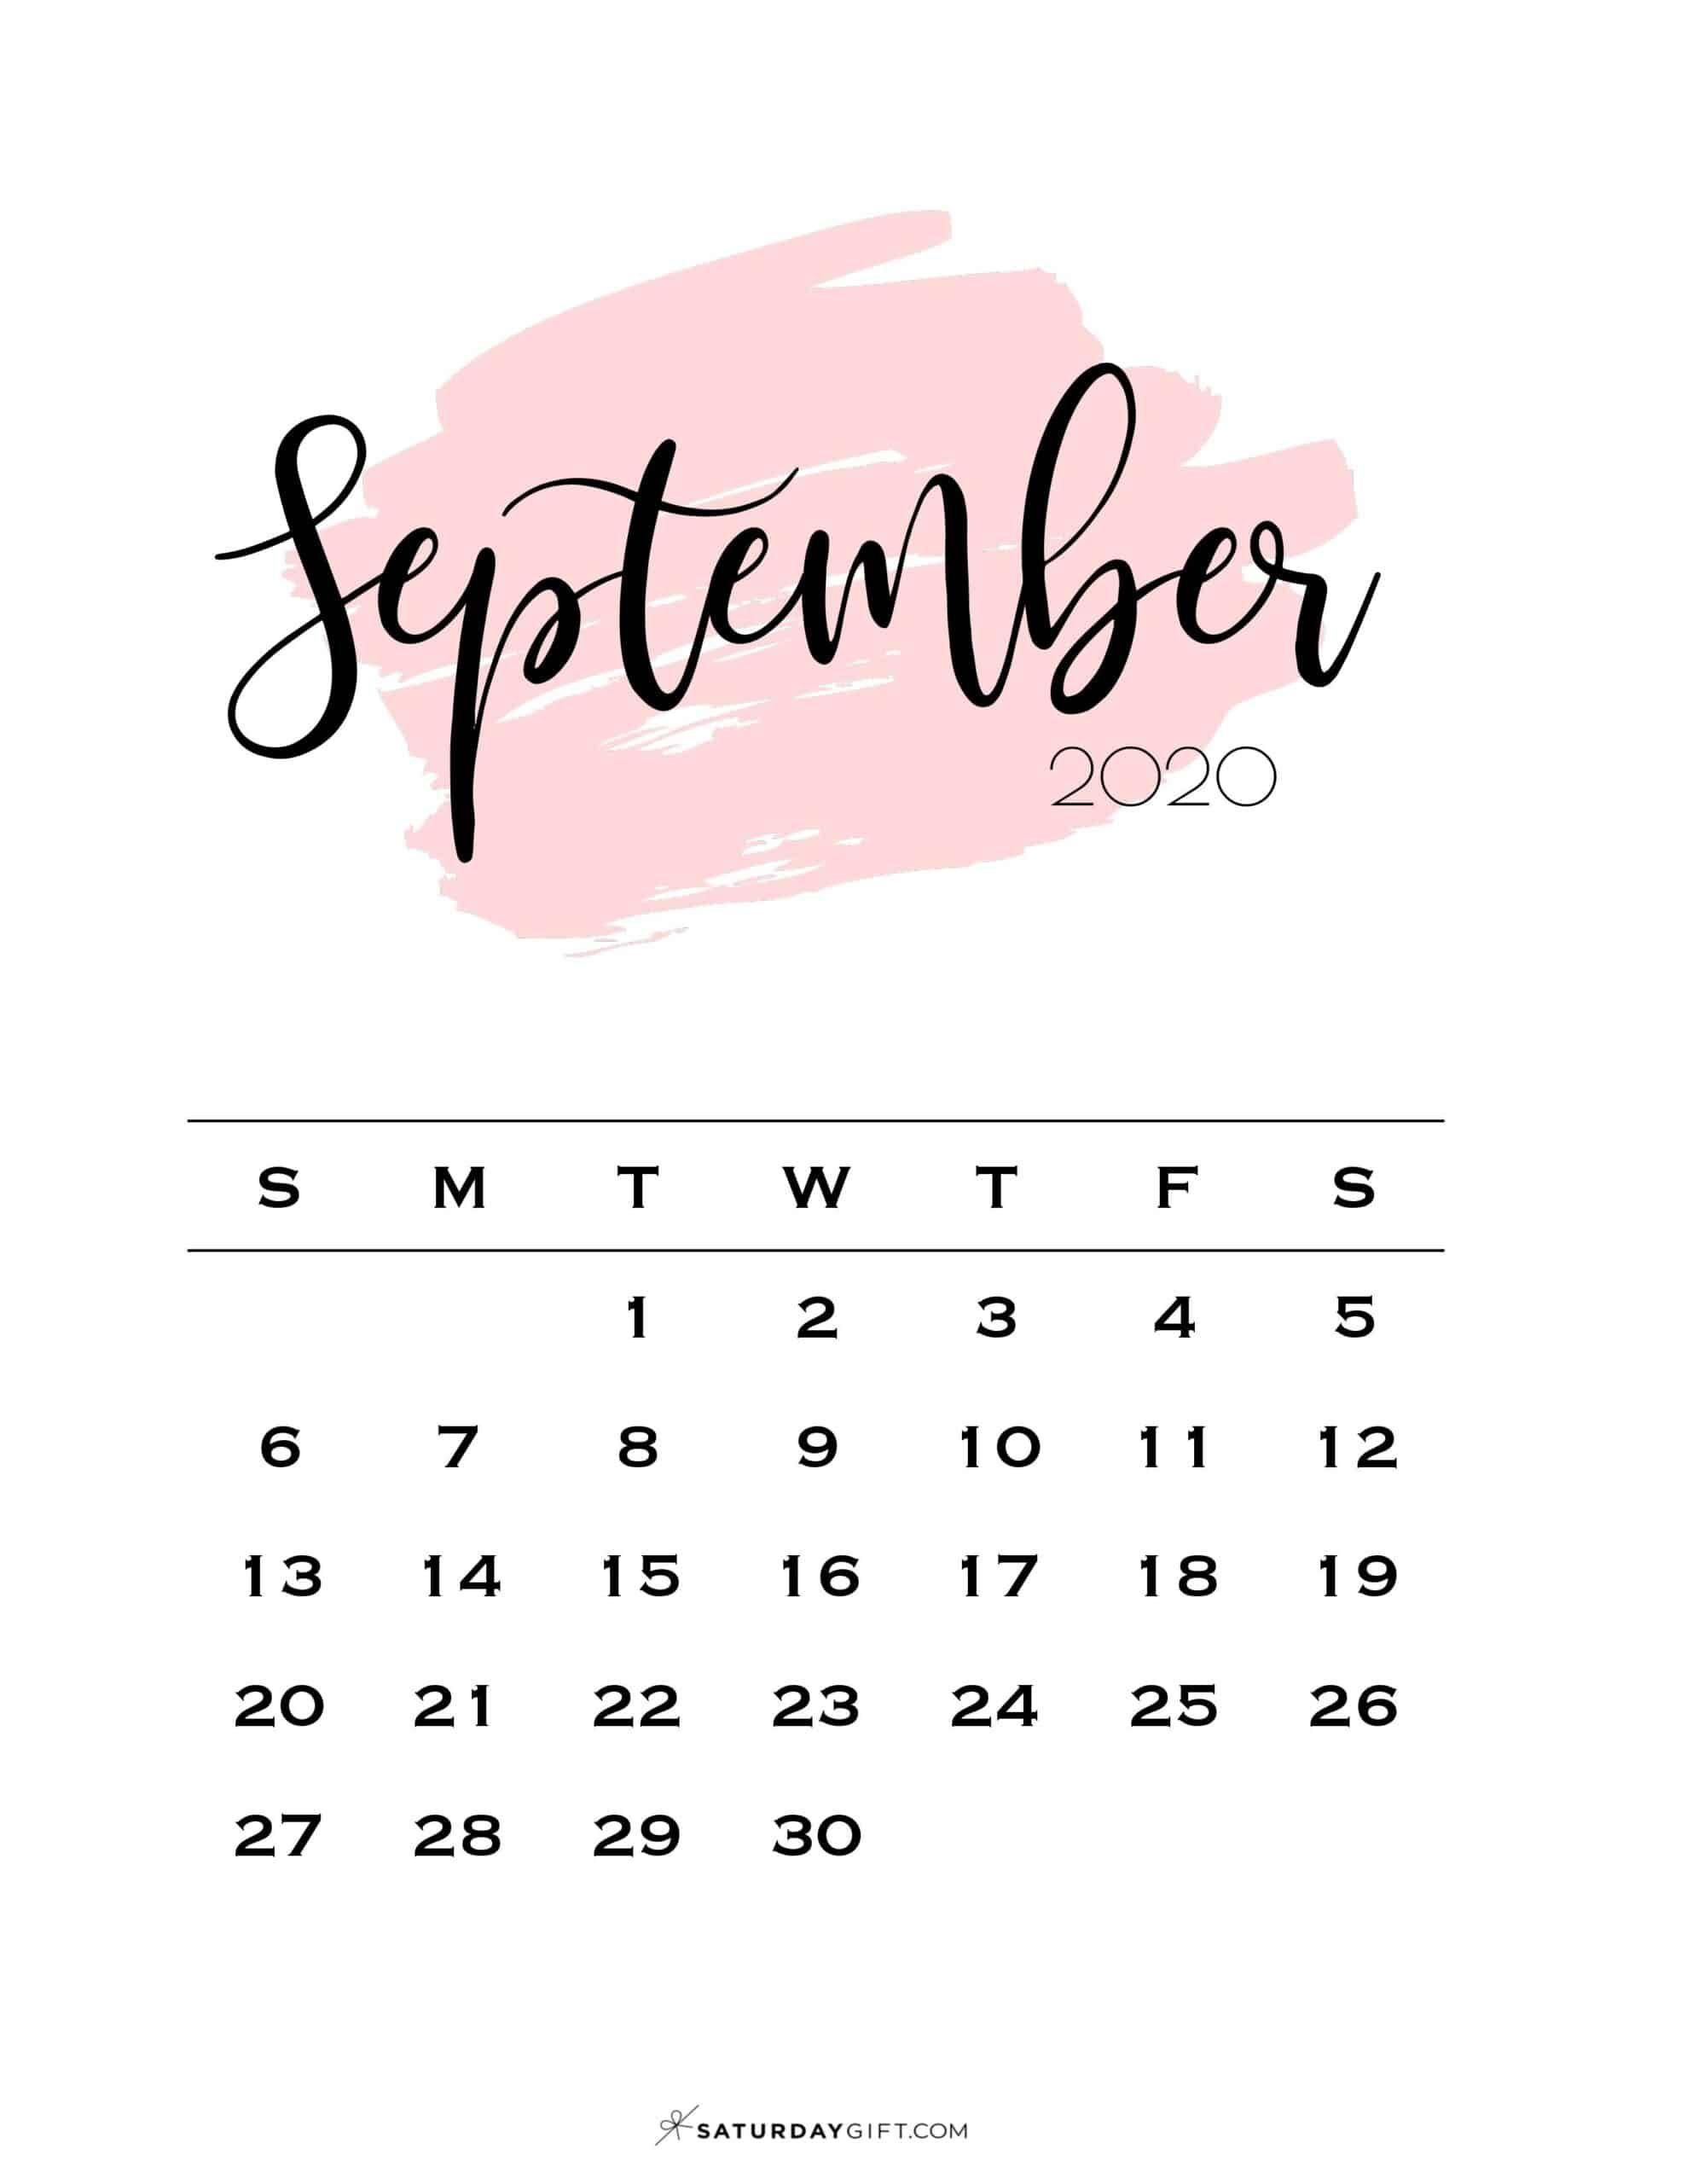 Cute Free Printable September 2020 Calendar Saturdaygift In 2020 Free Calendar Template Free Calendar Print Calendar